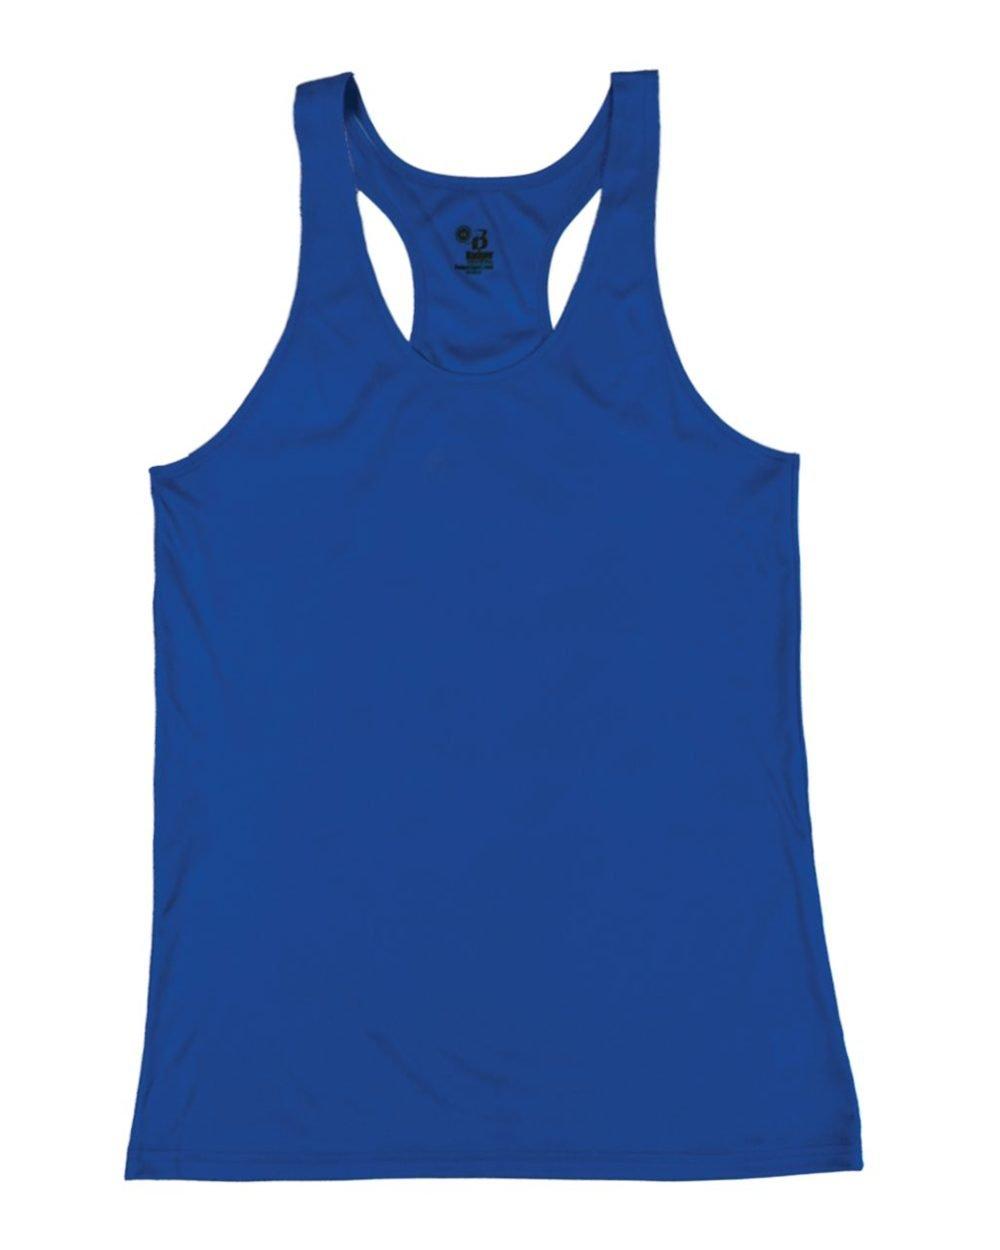 Royal Blue Girls Medium B-Core Moisture Wicking Racerback Tank Sports Top